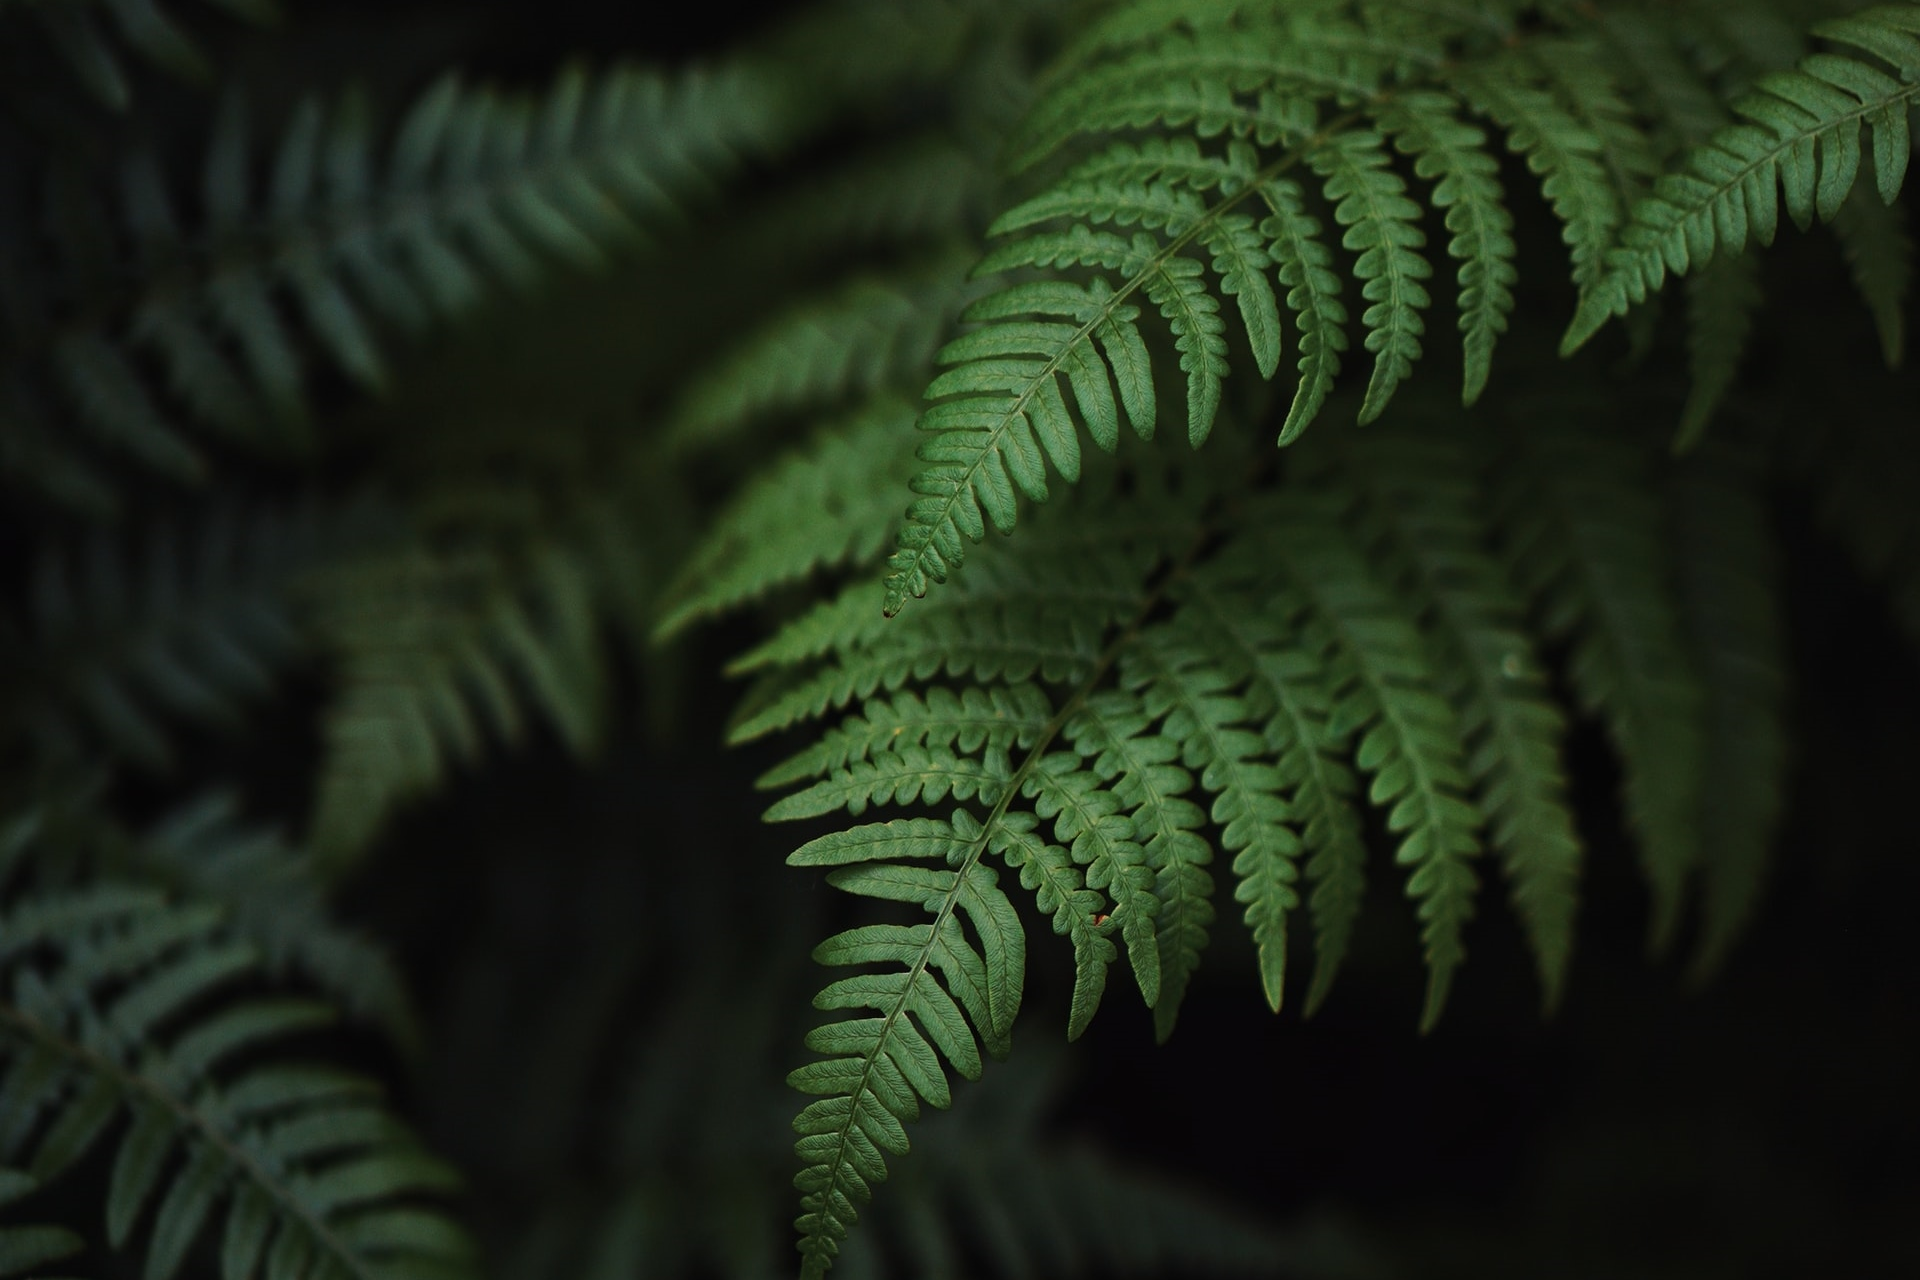 10 Tanaman Hias yang Bisa Tumbuh Tanpa Tanah, Bikin Estetik!